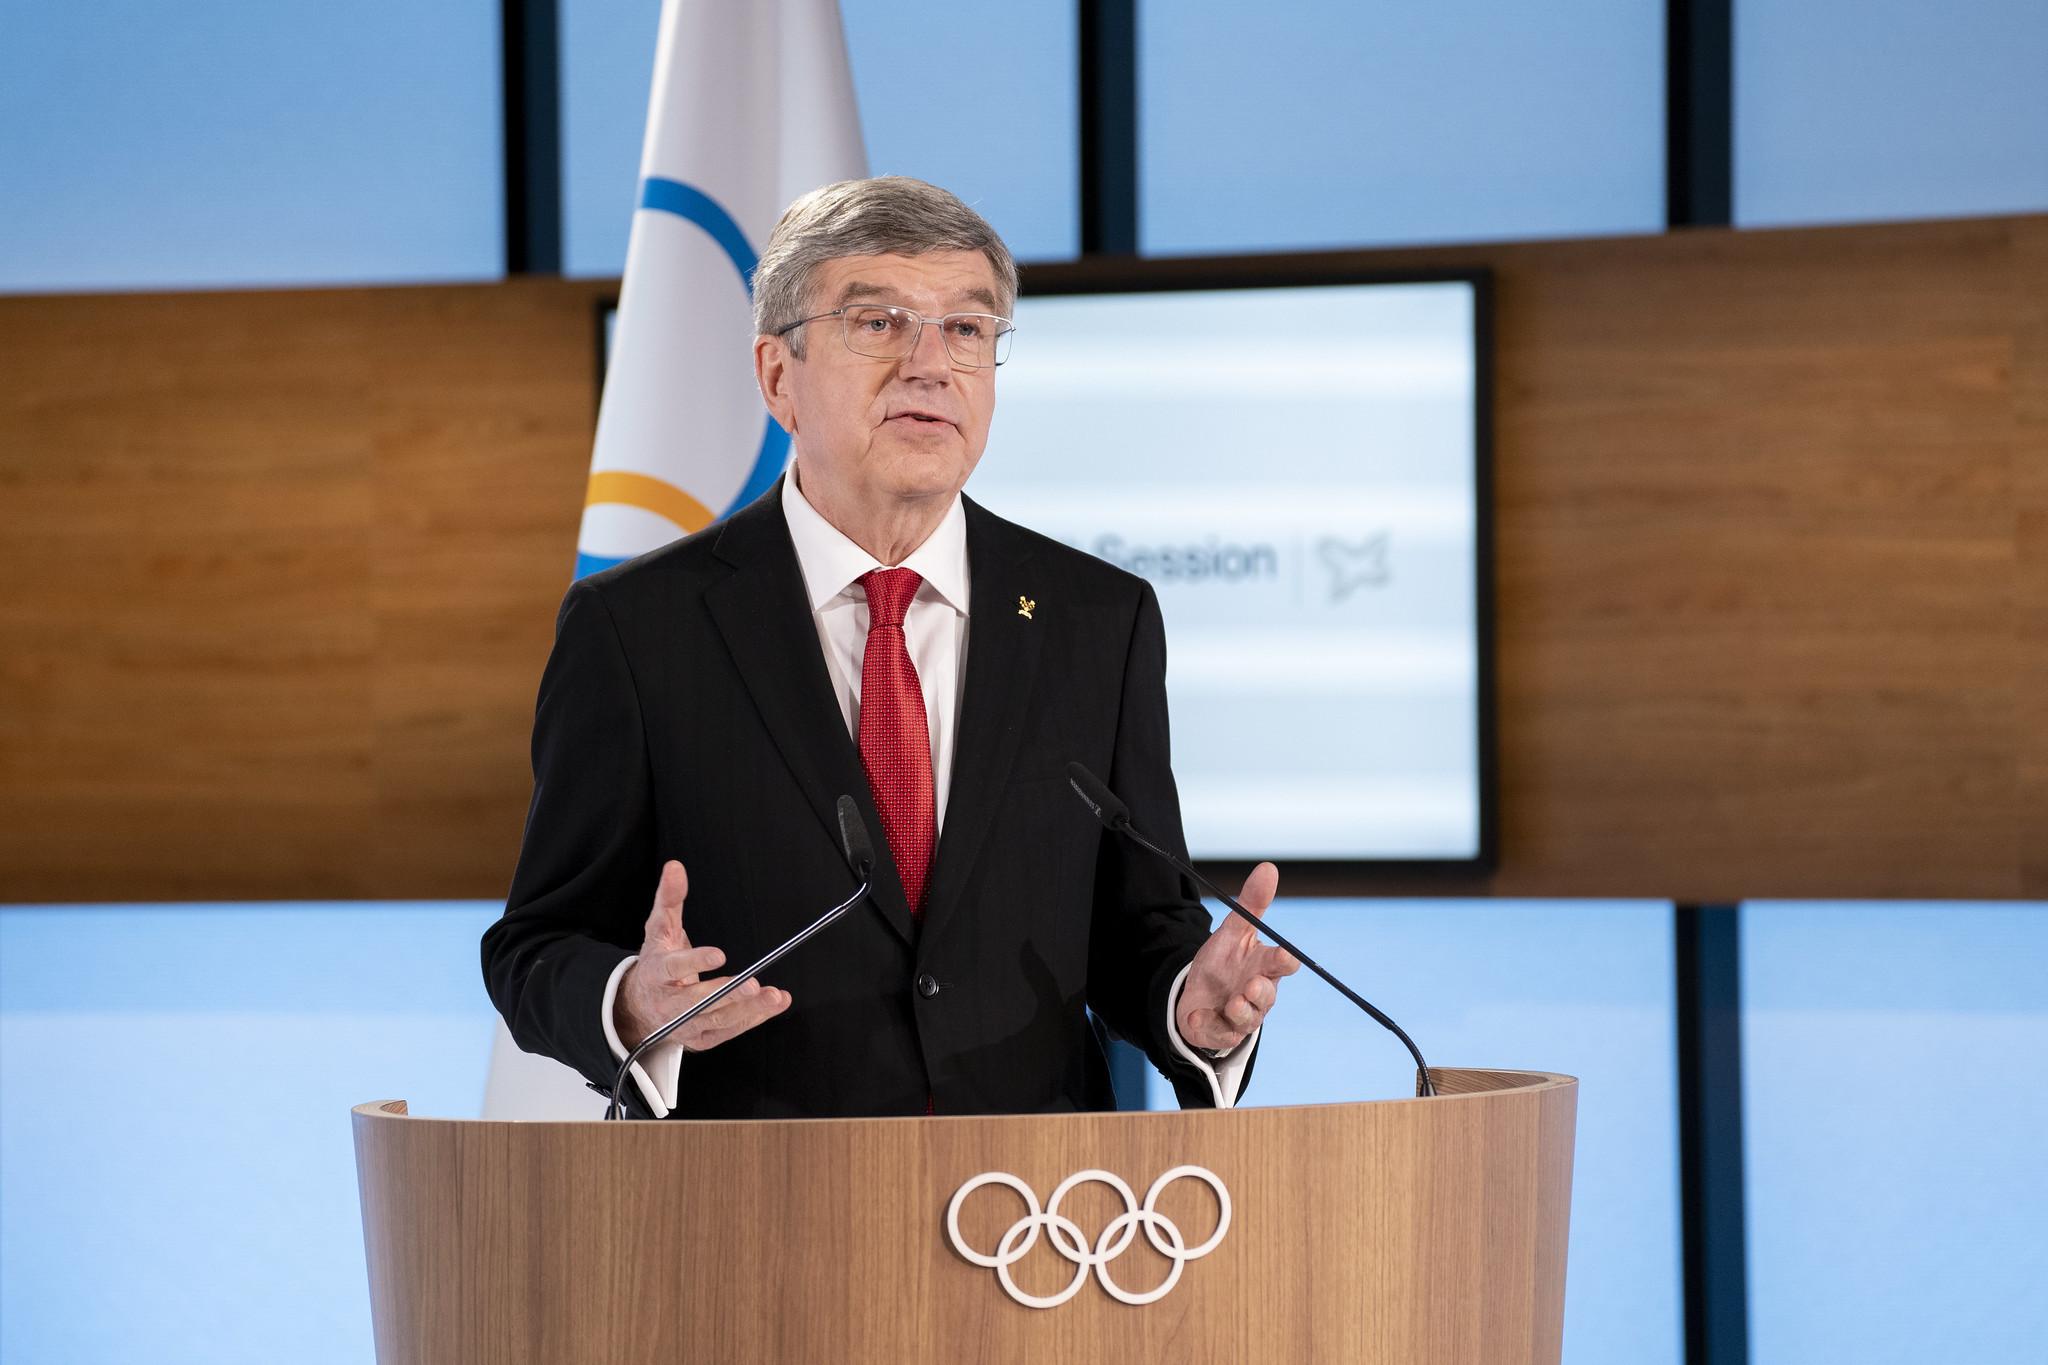 The IOC President also presented the closing report of Agenda 2020 ©IOC